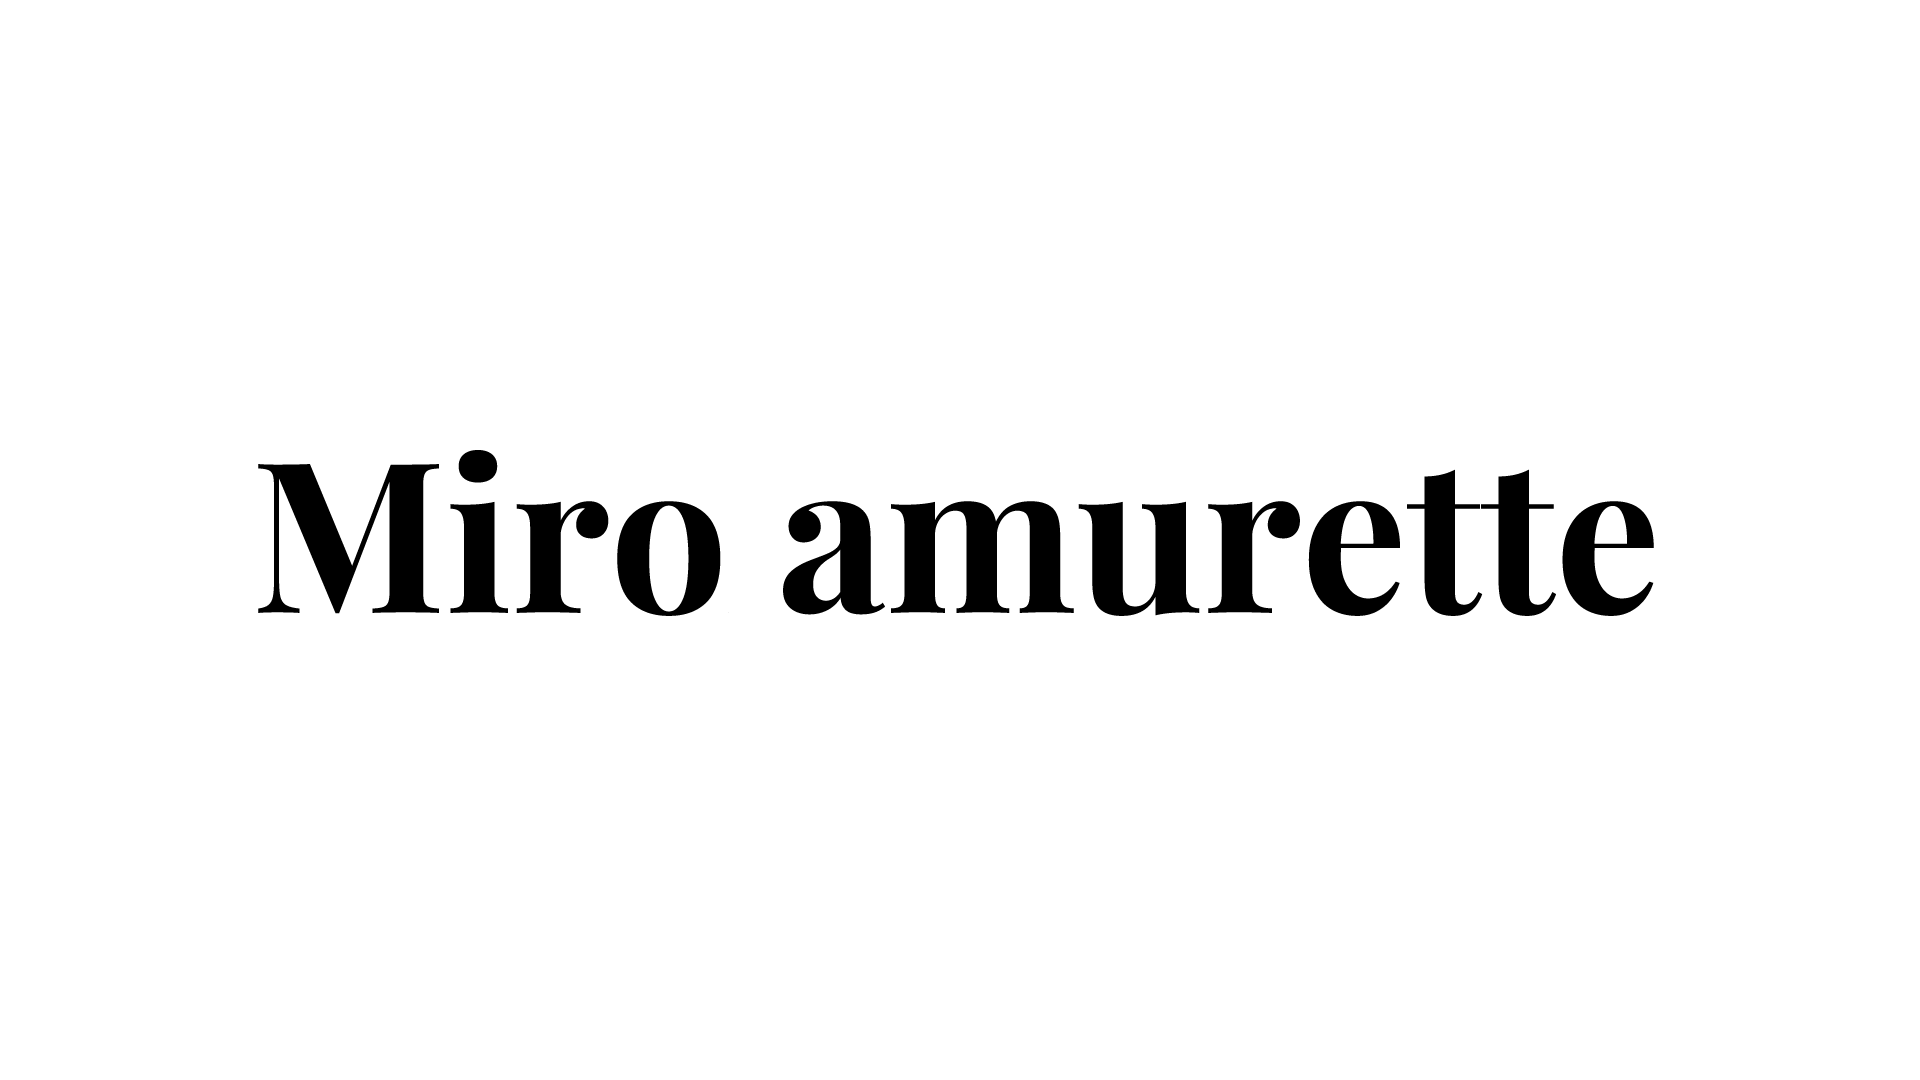 MD募集!SNS発D2Cブランド<Miro amurette>のカバー写真